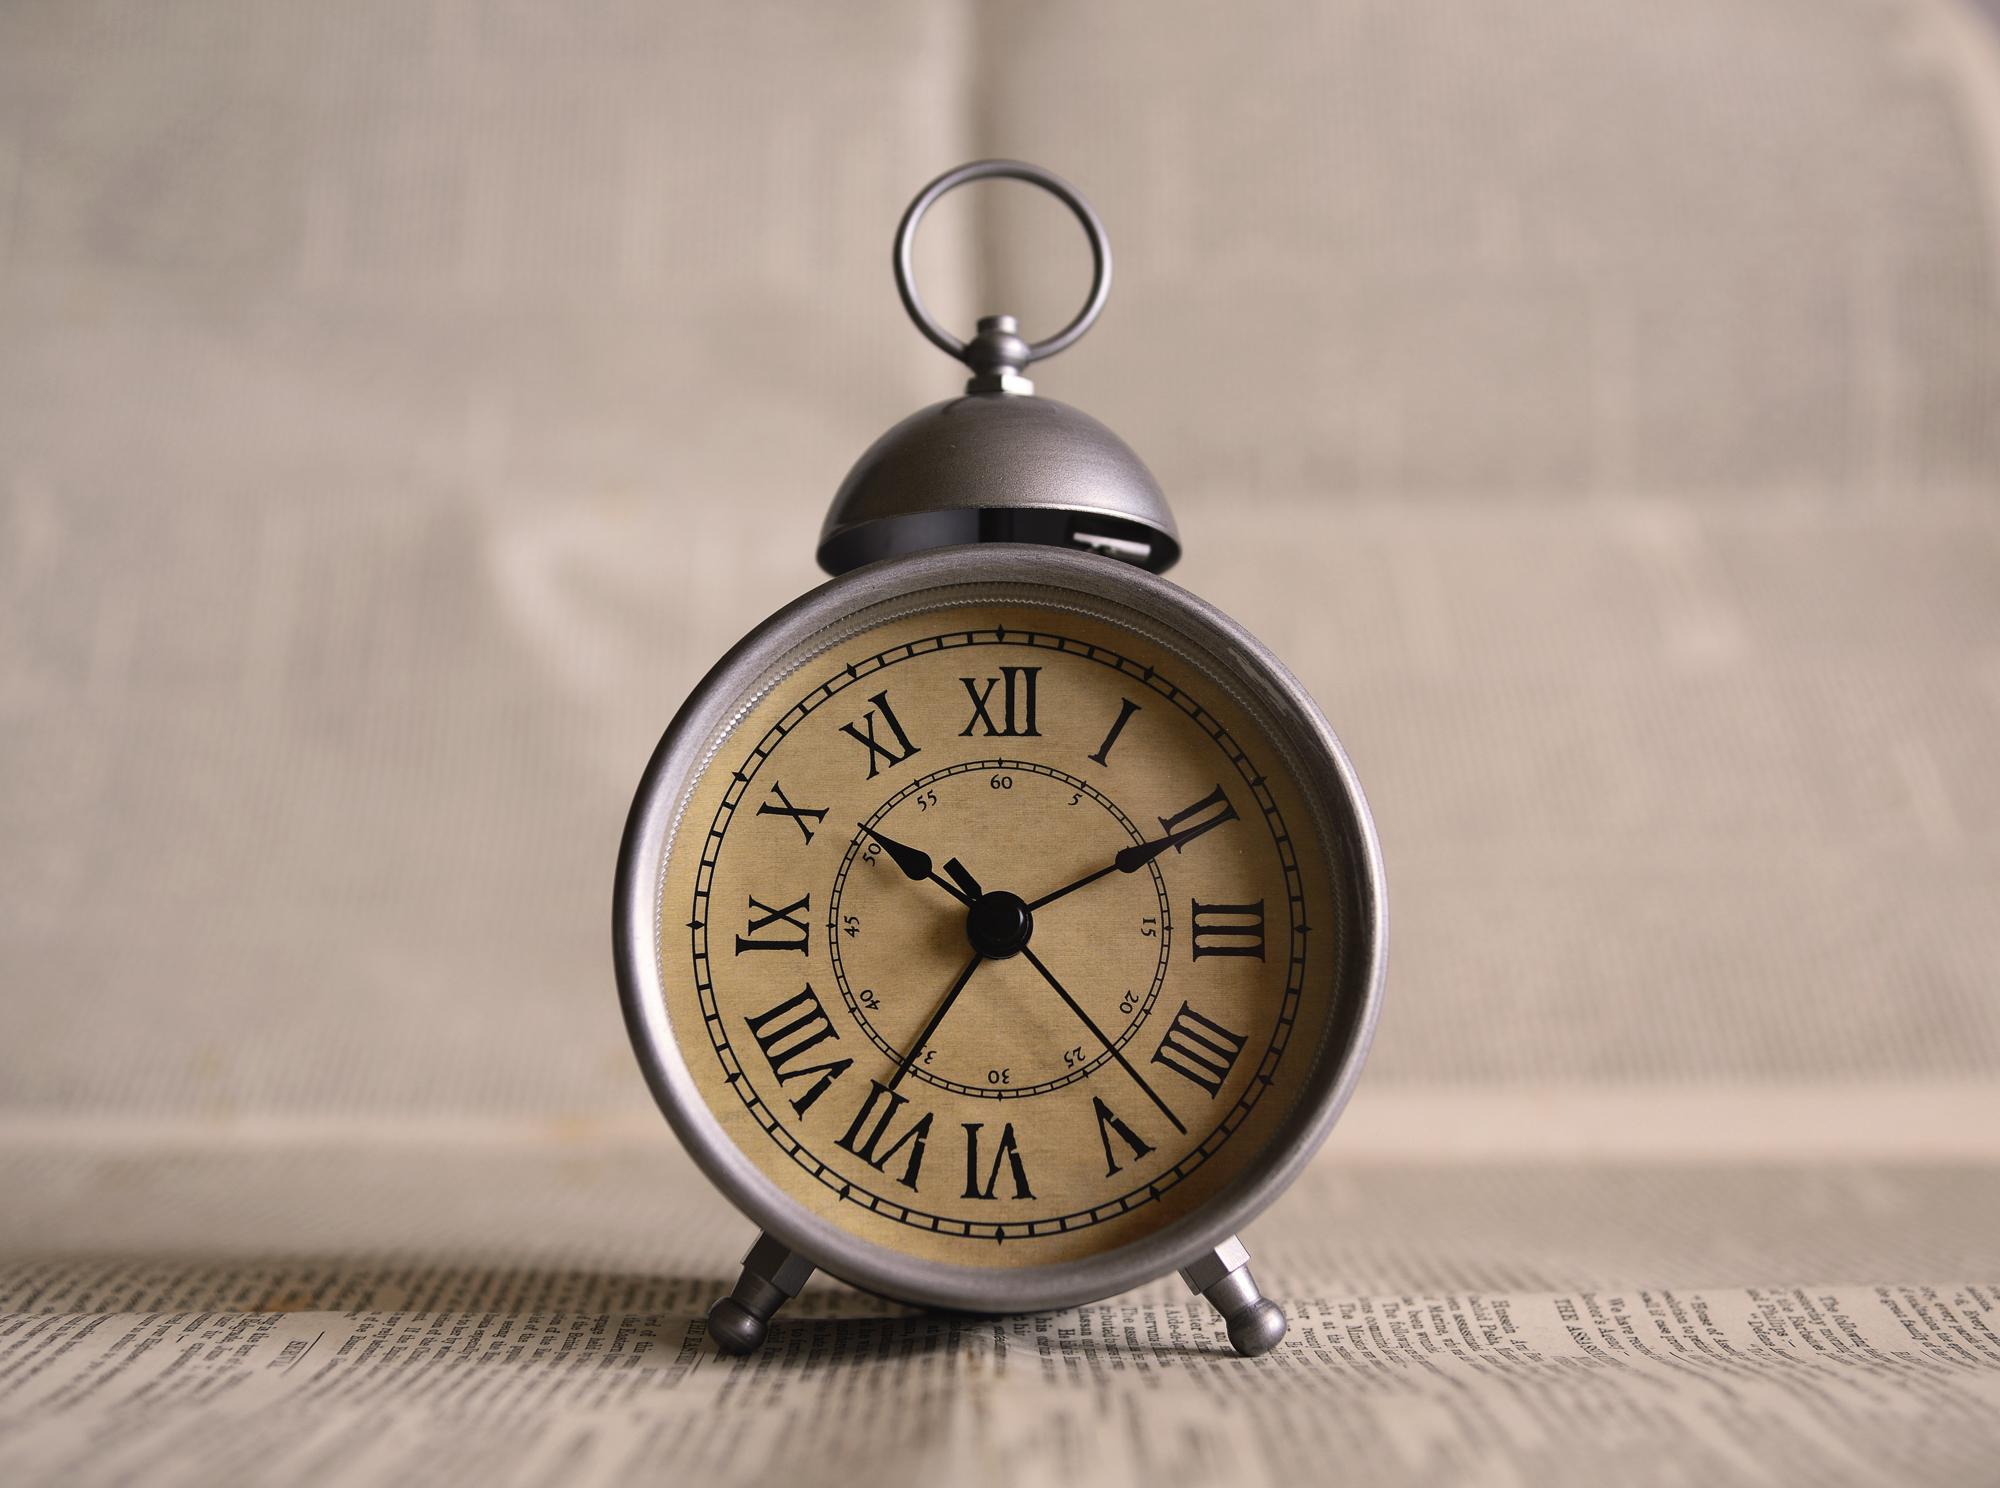 econslab_aged-alarm-clock-antique-552774.jpg